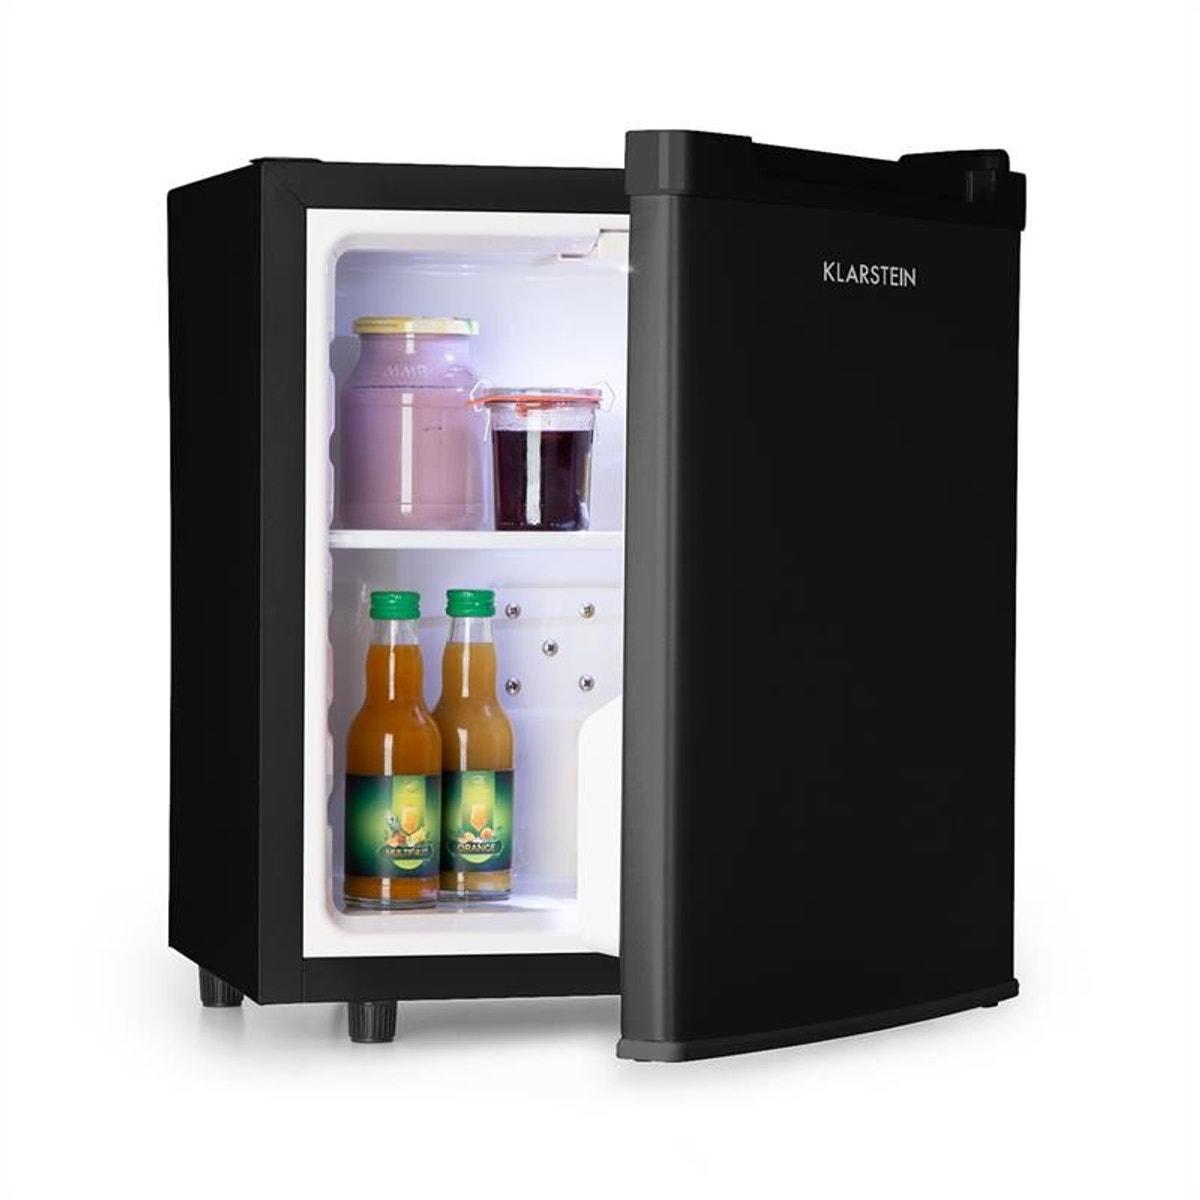 Silent Cool Refrigerateur 30l 24db Arctic Fox Cooling Classe A